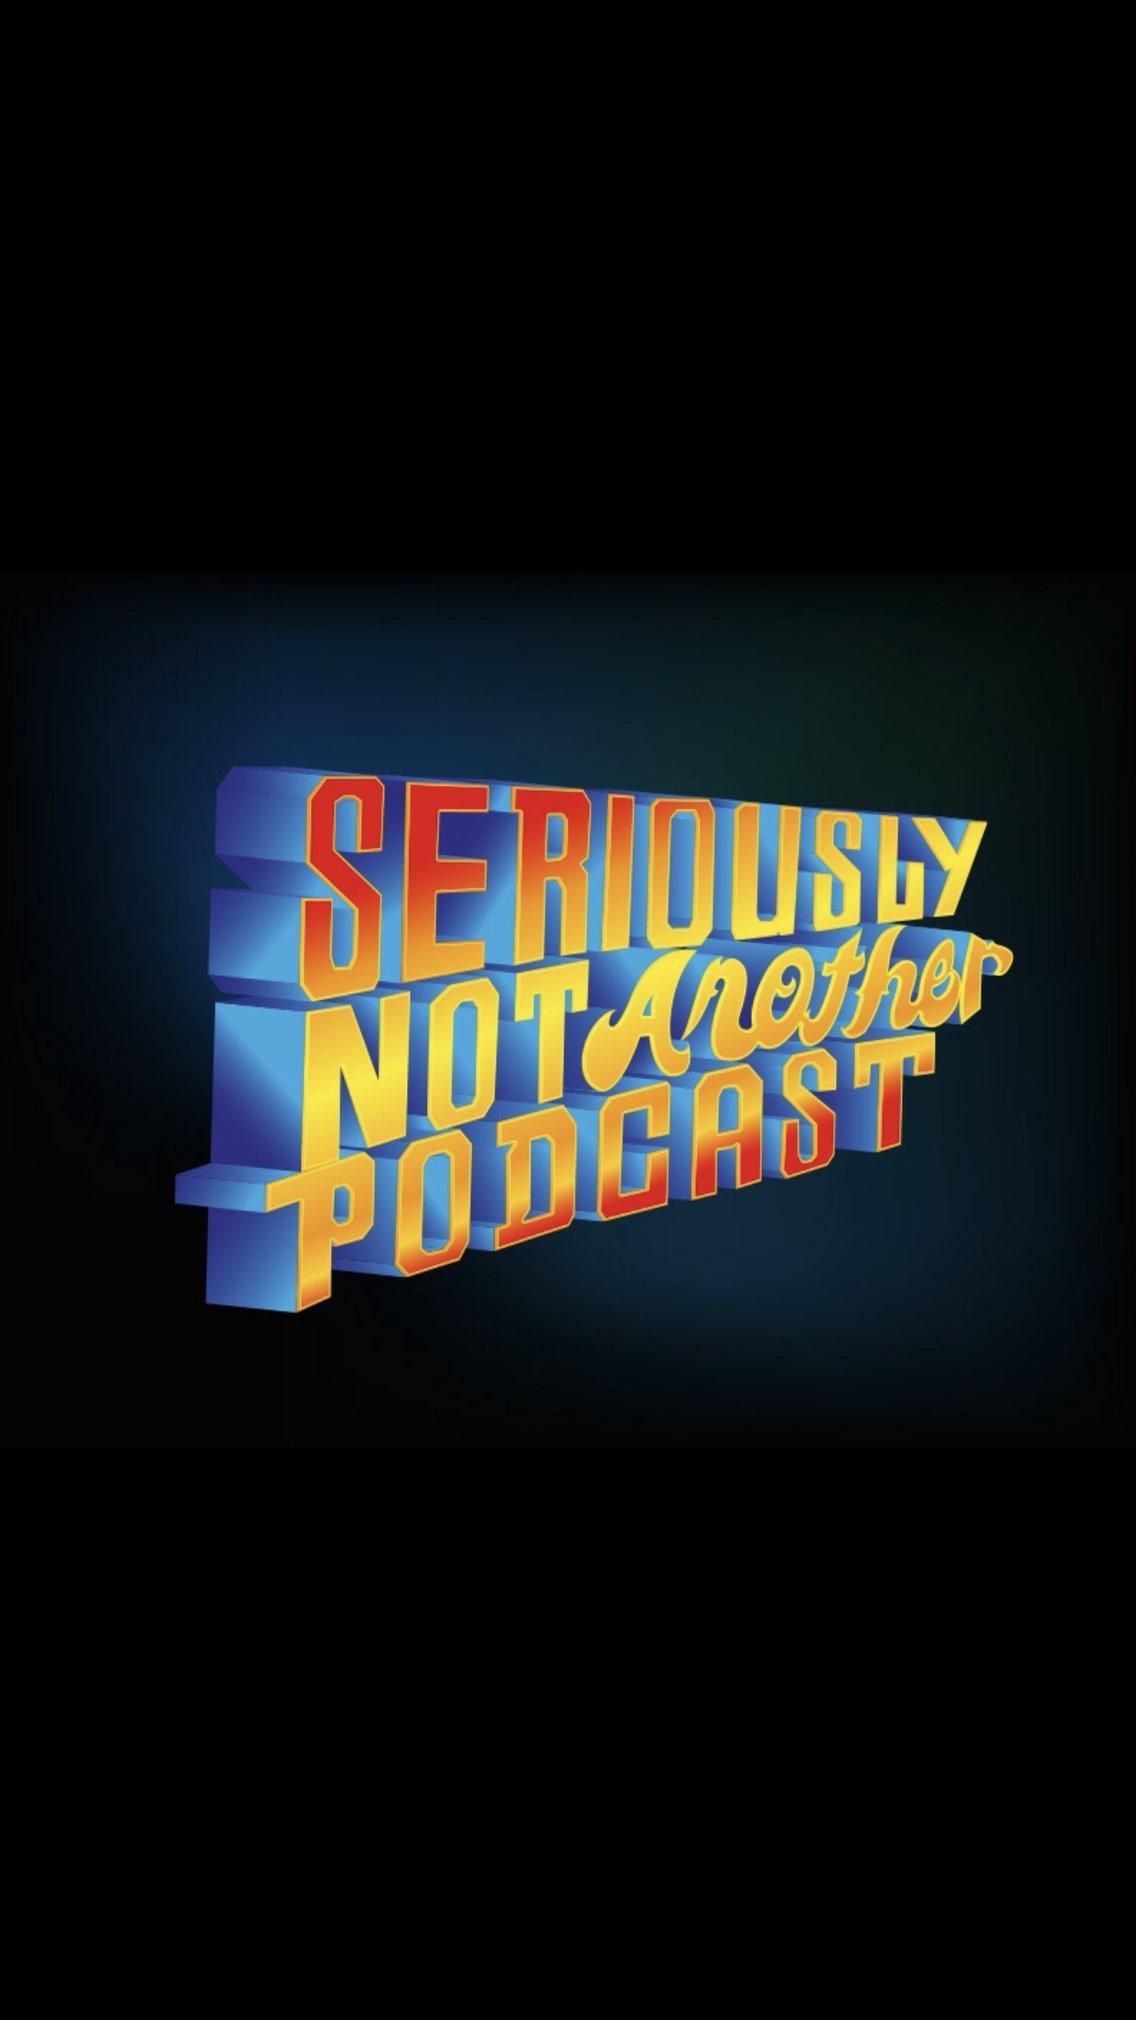 Seriously? Not Another Podcast - imagen de portada